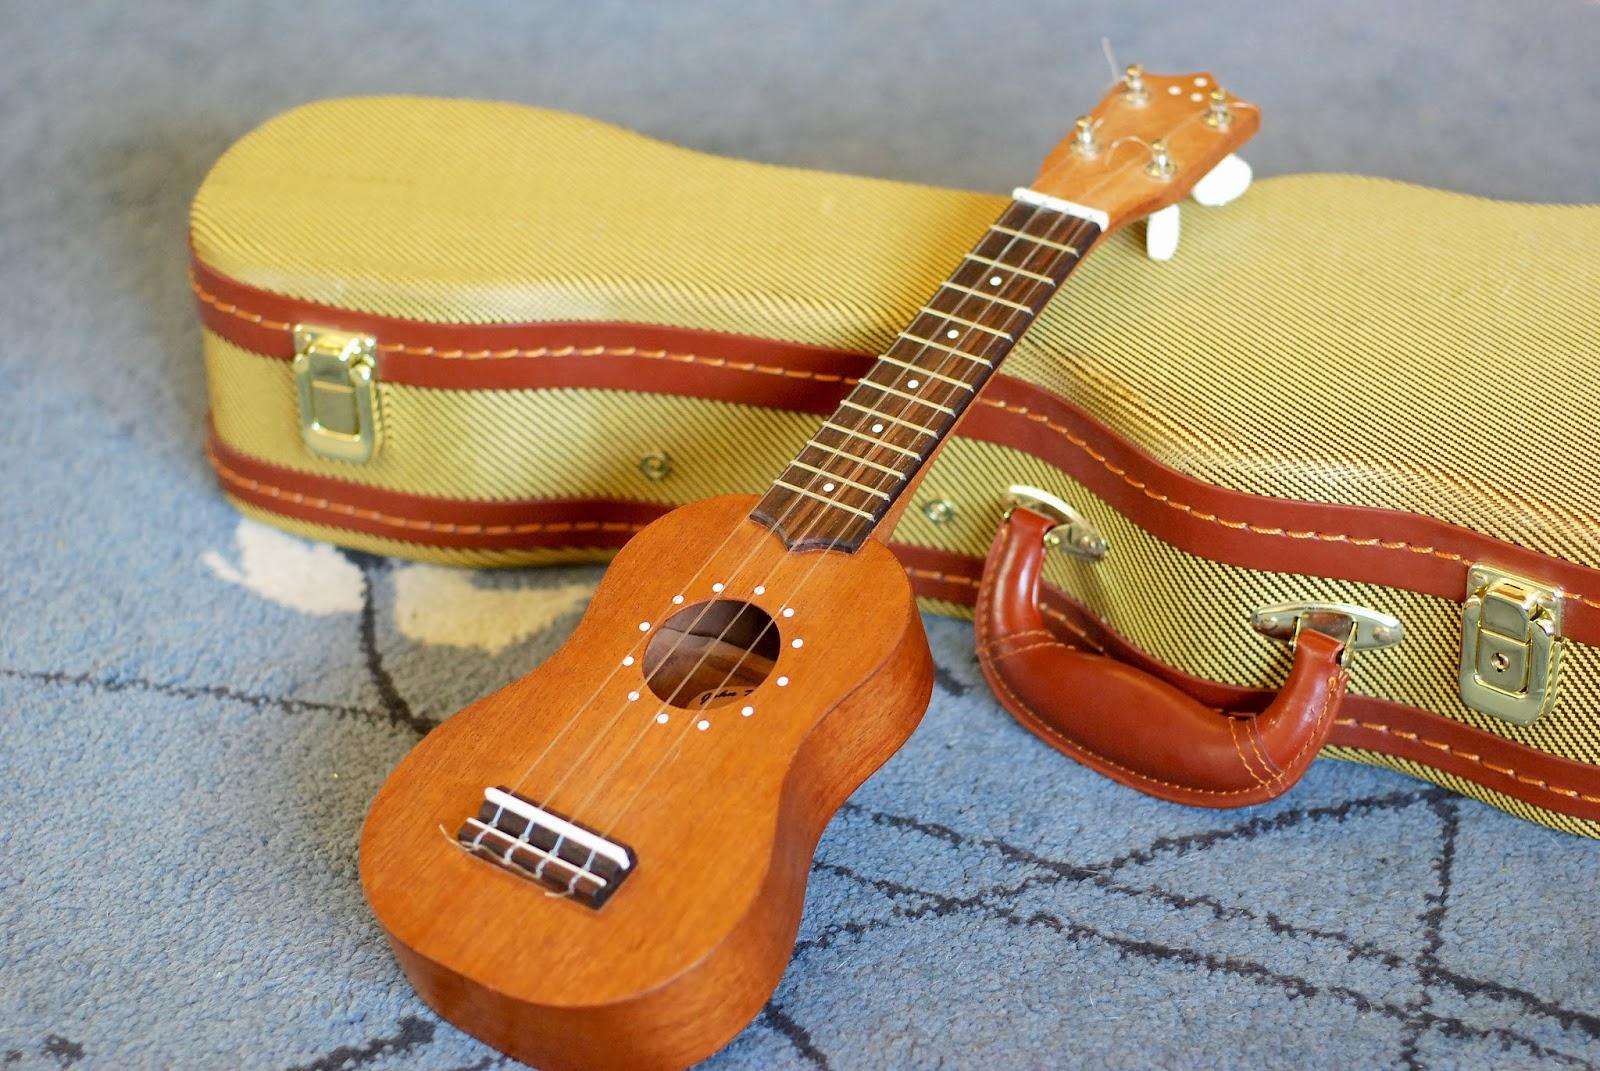 John Daniel Pixie Sopranino ukulele